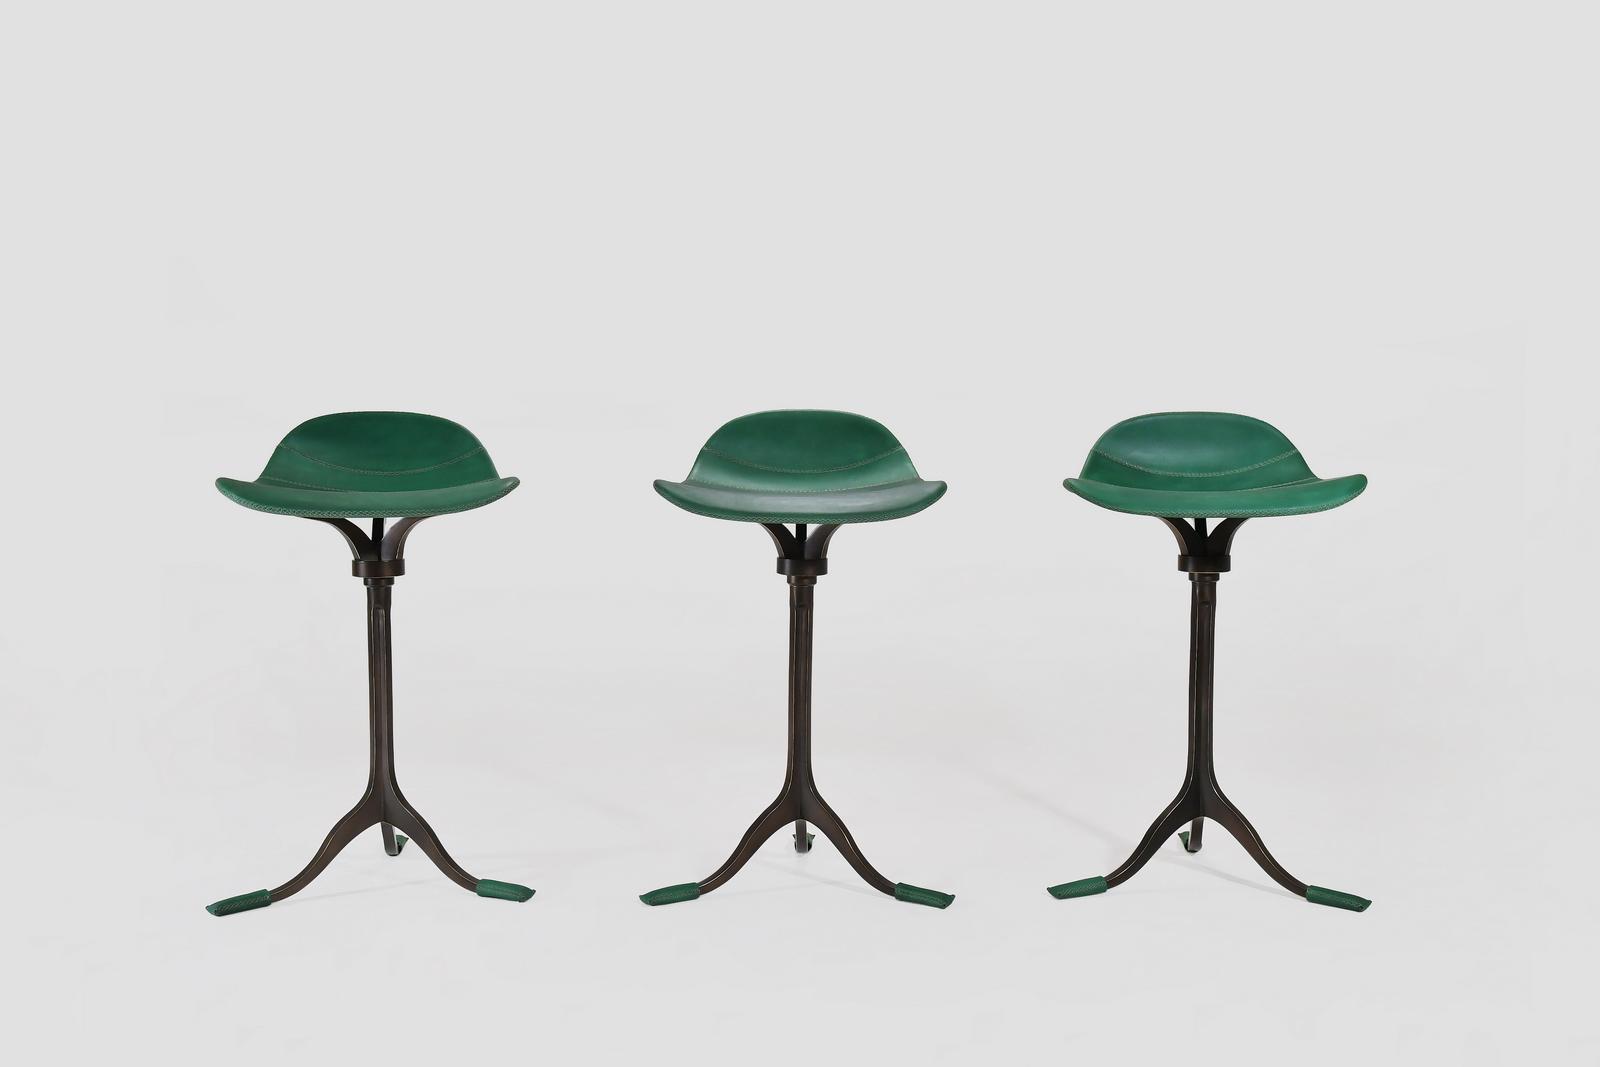 PTendercool-Chair-PT48-BS3-GR-01